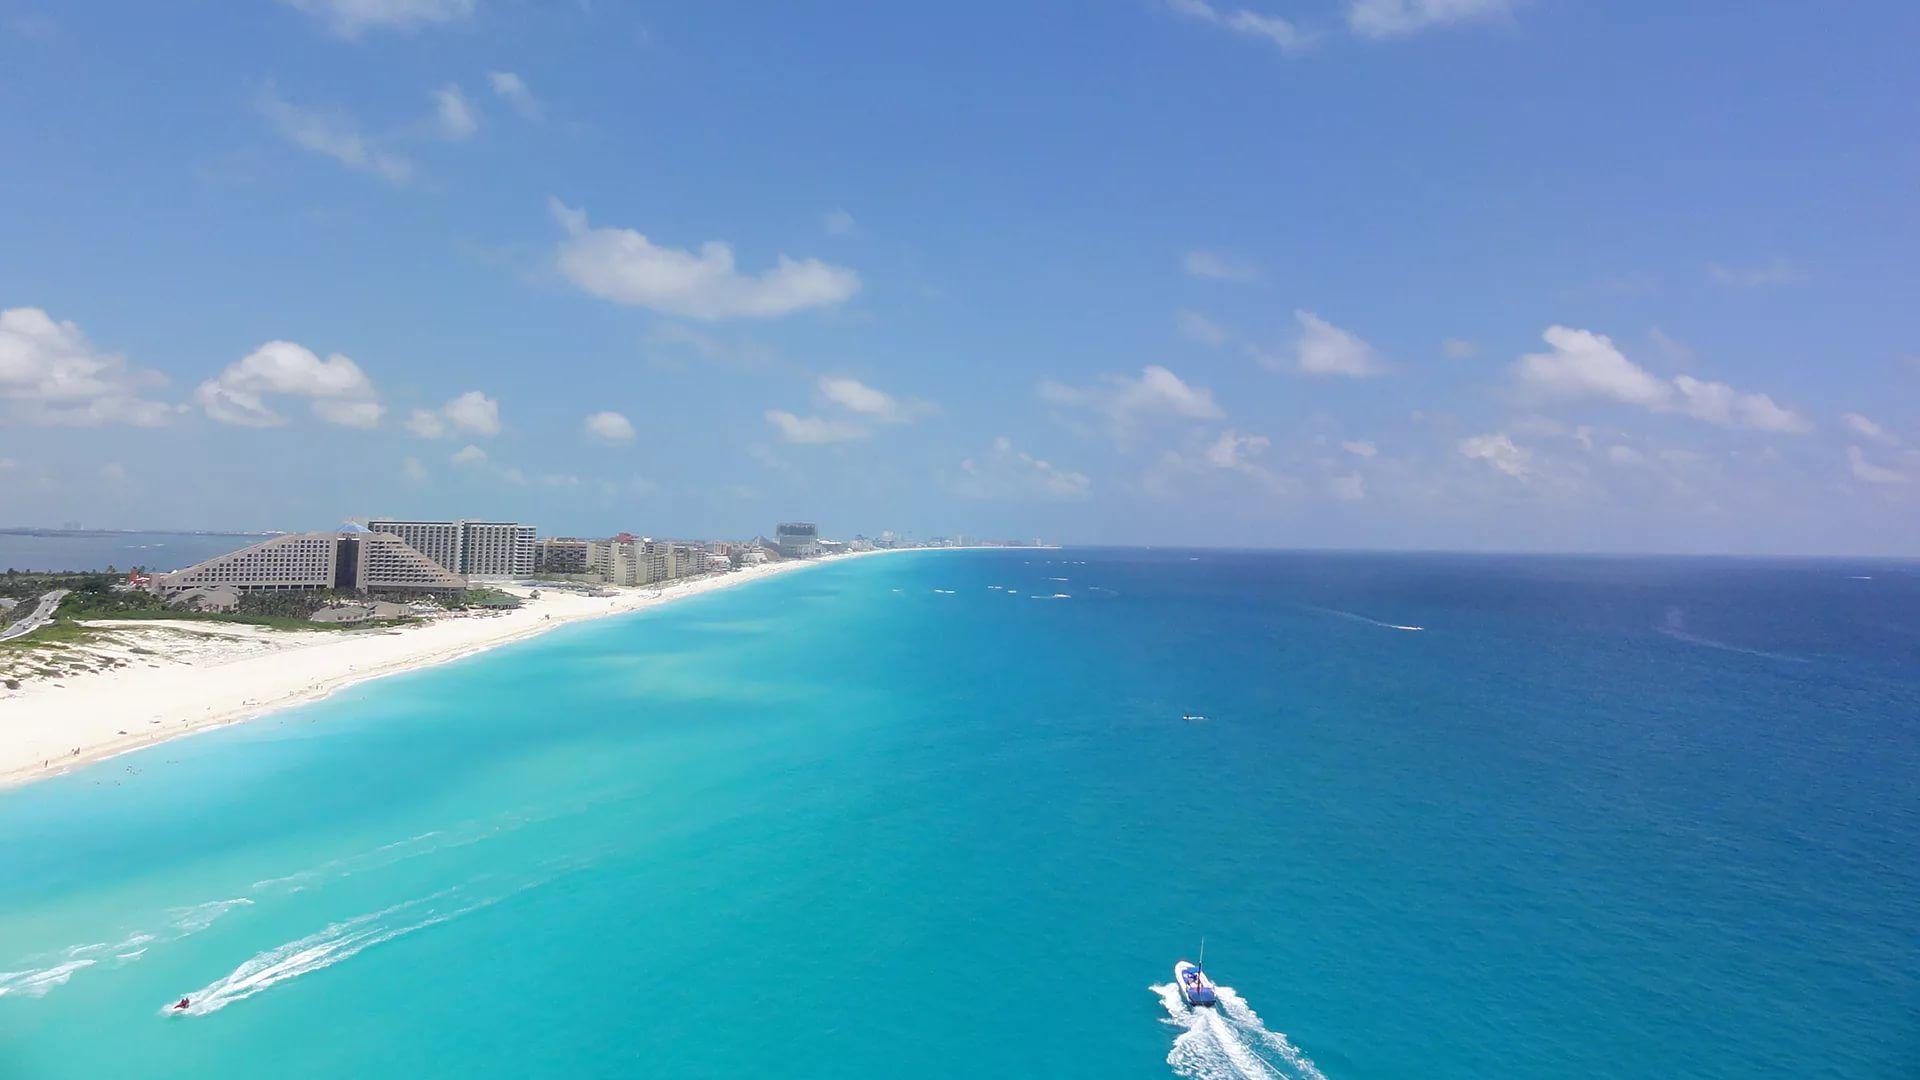 Cancun Mexico High Quality